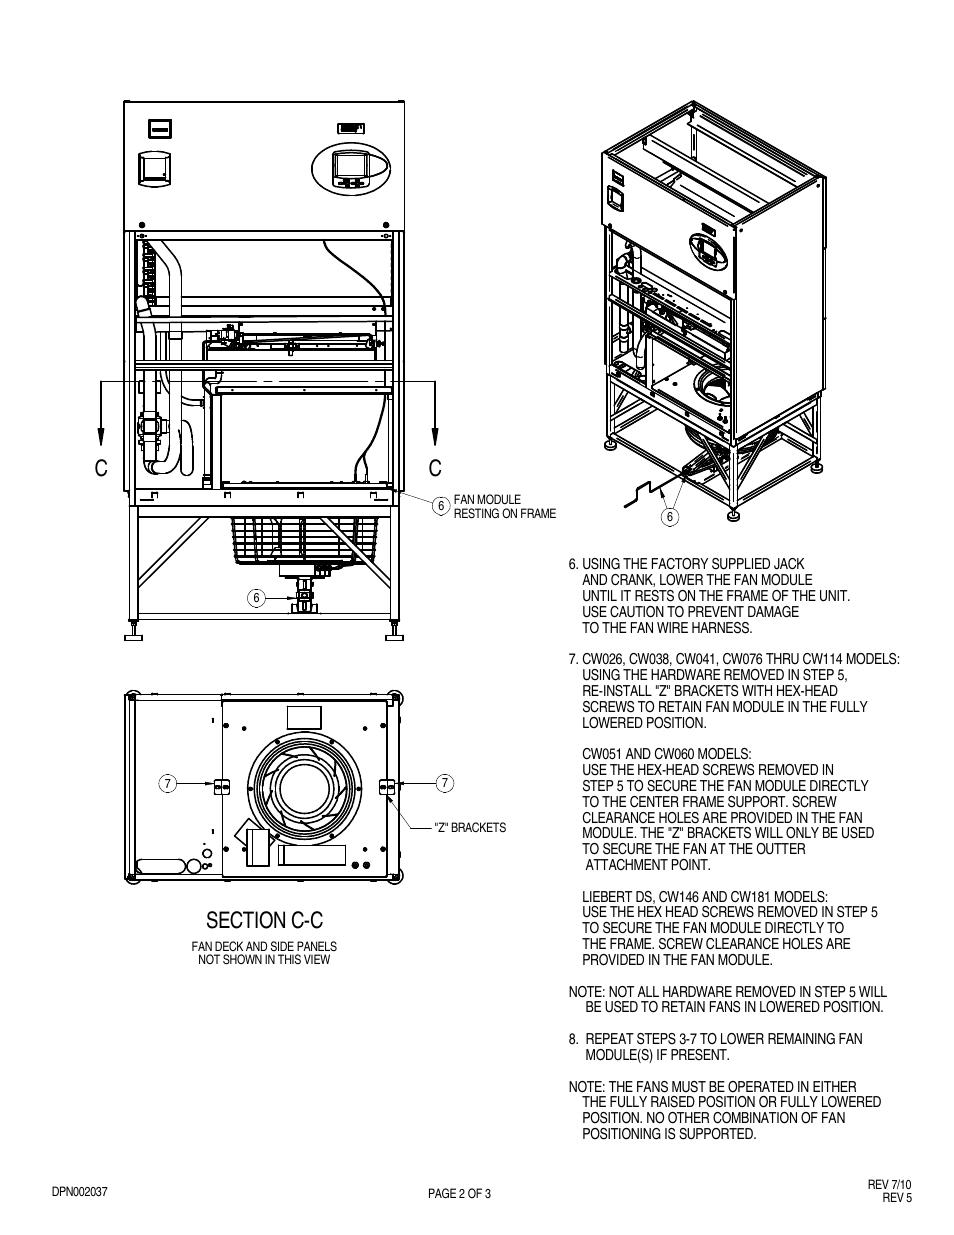 Liebert EC FAN CW076 THRU CW114 User Manual   Page 2 / 3   Also for on